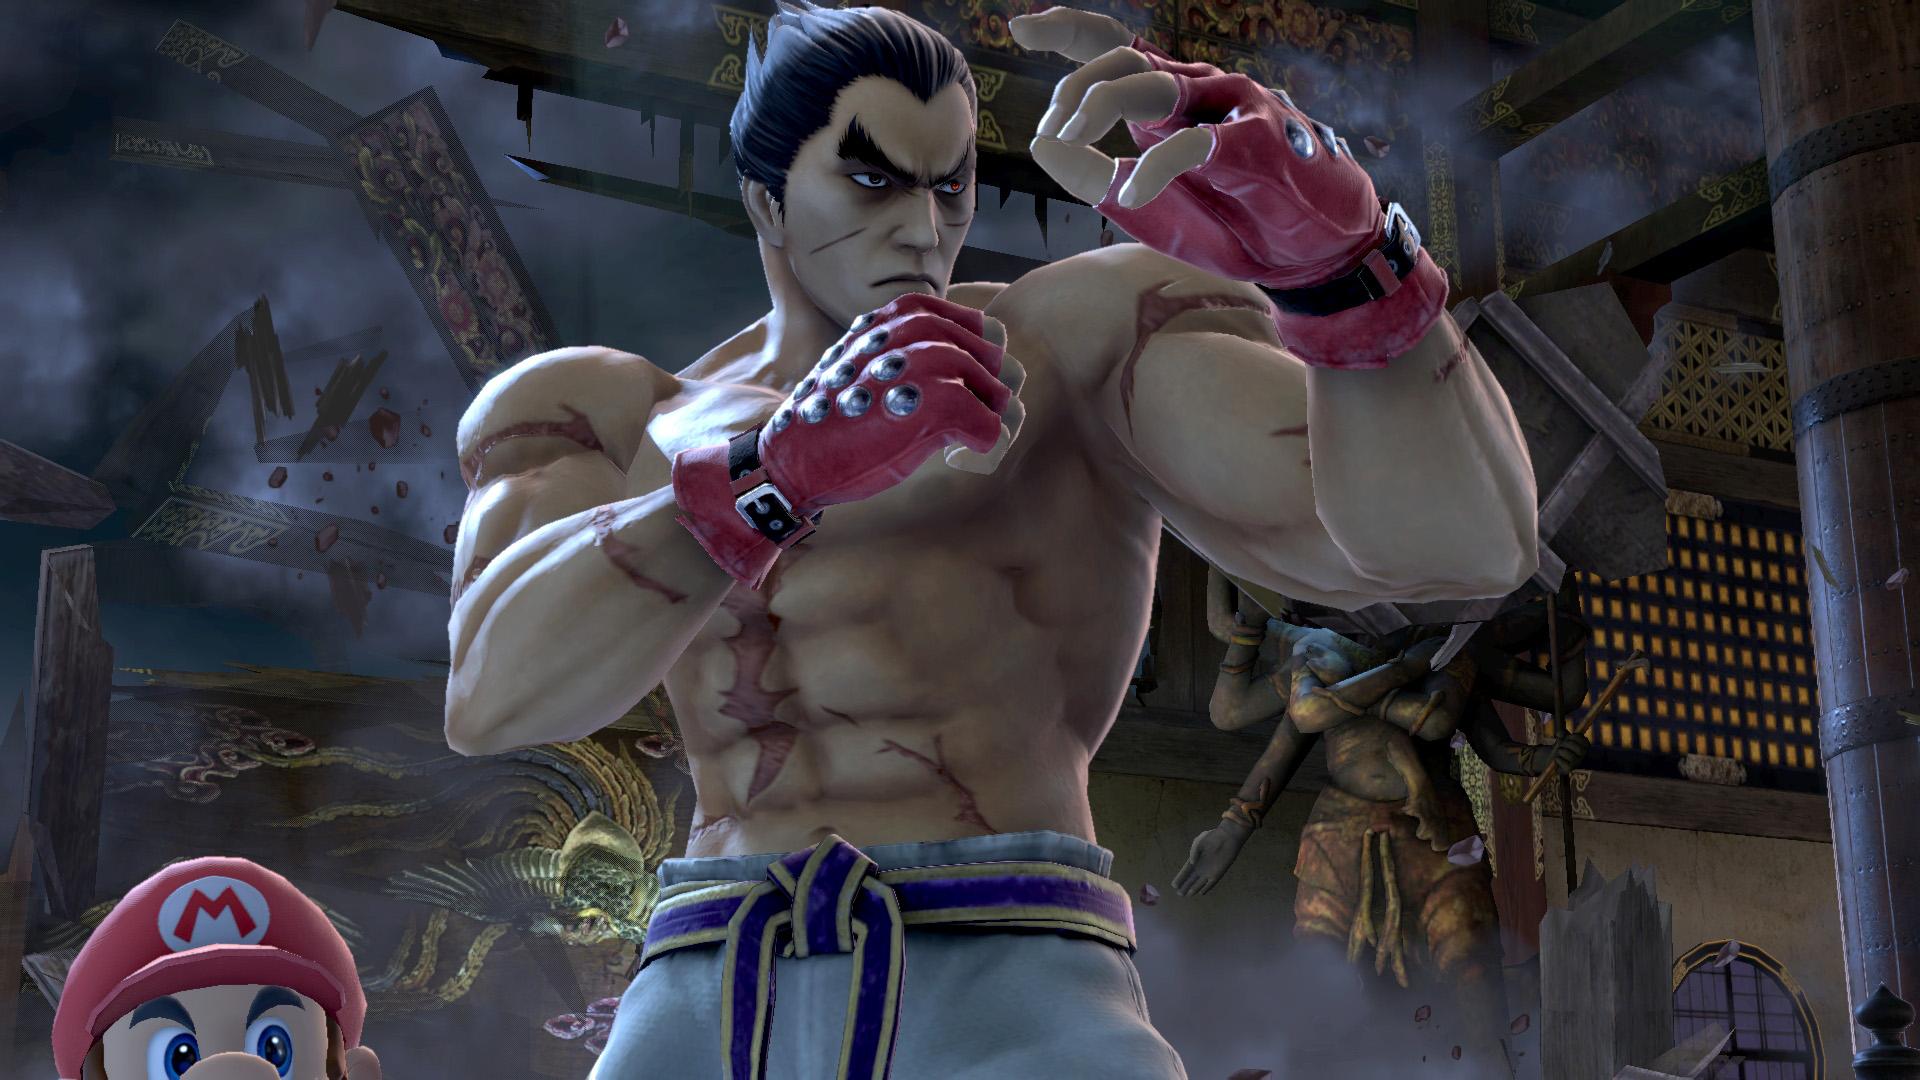 Super Smash Bros. Ultimate Kazuya release date | Shacknews